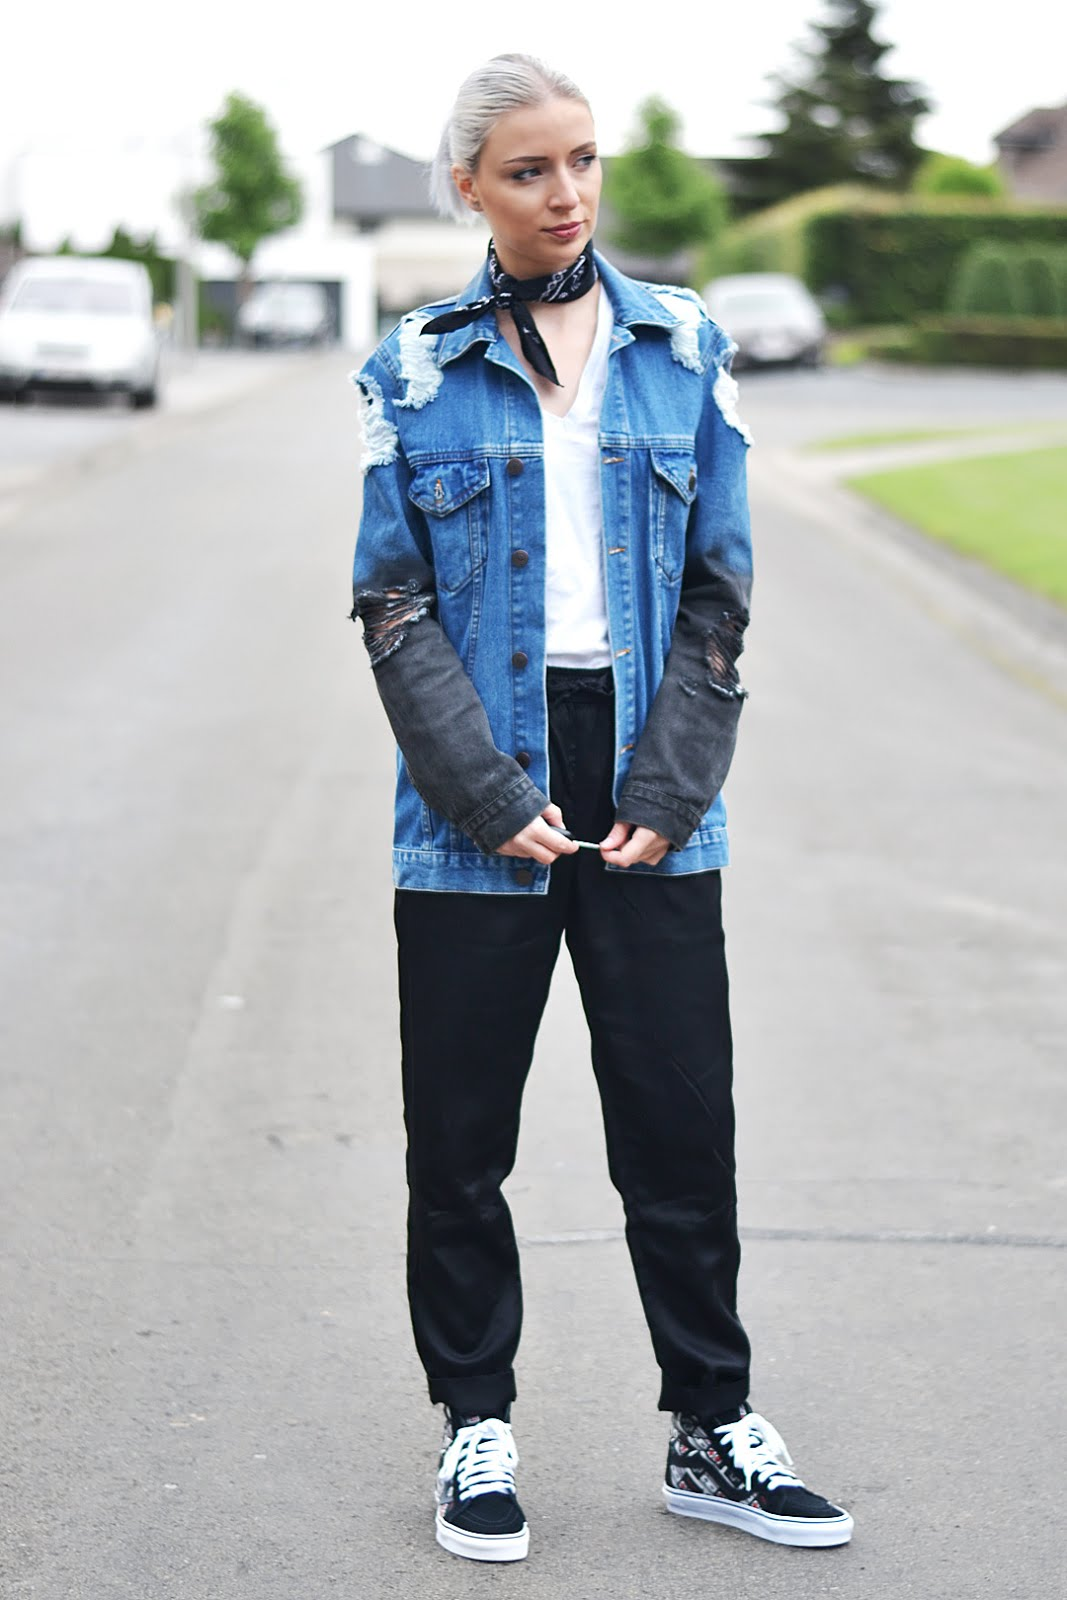 Vans x nintendo sneakers, ripped denim, asos, joggers, outfit, street style, belgian blogger, belgische mode blogger